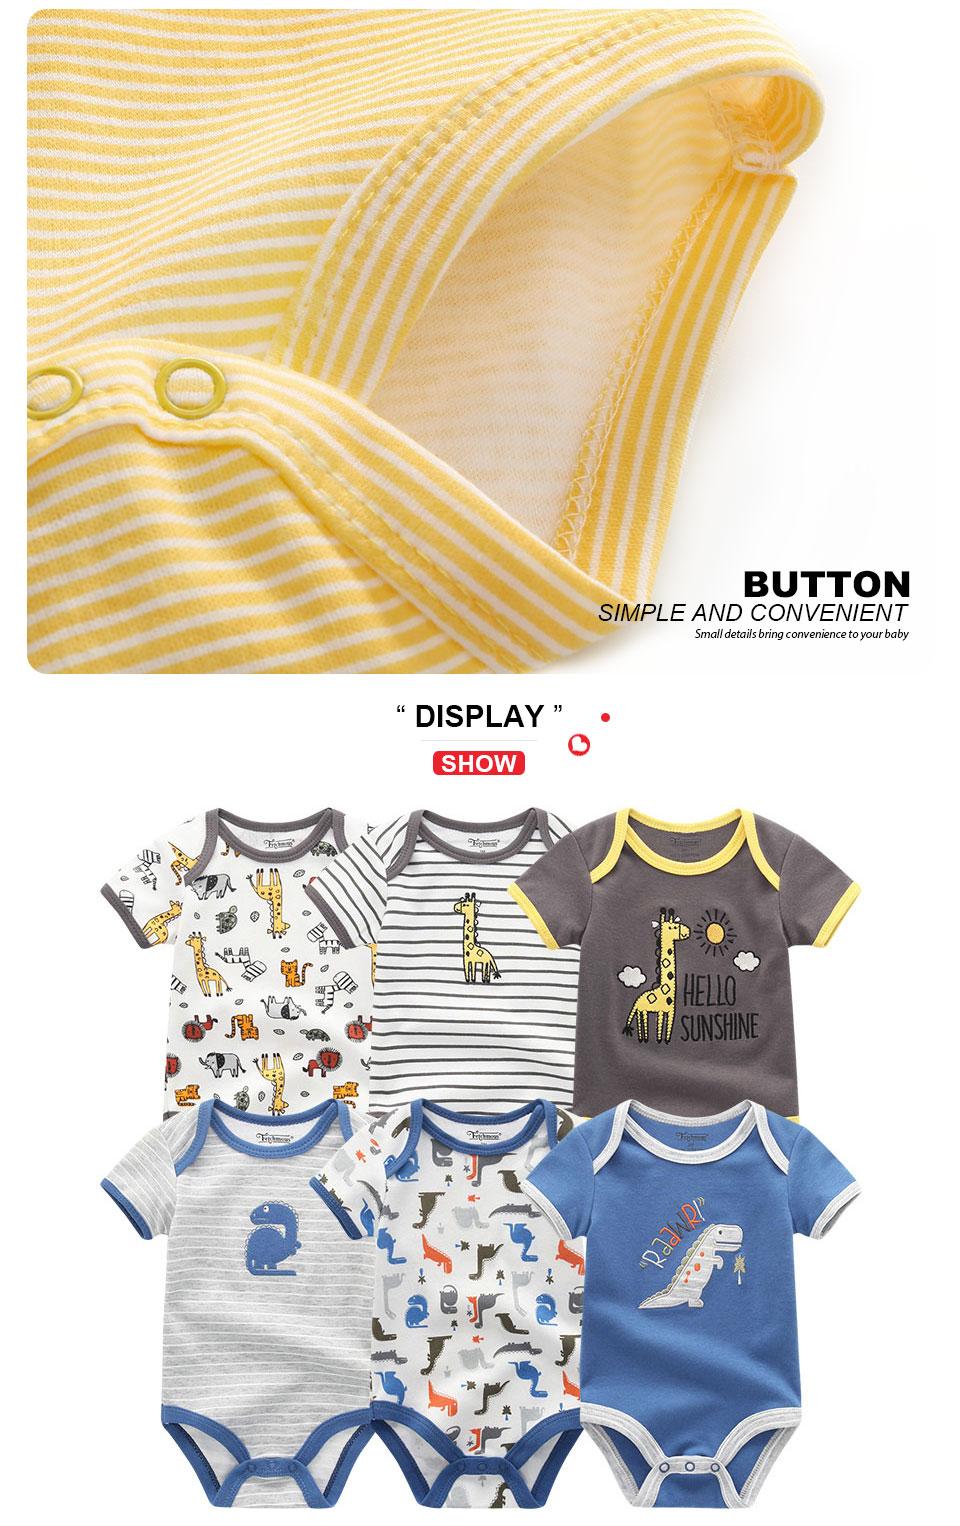 HTB1iq7.BIuYBuNkSmRyq6AA3pXaB 2019 6PCS/Lot Unisex Unicorn Baby Boy Clothes Cotton Kids Clothes Newborn Rompers 0-12M Baby Girl Clothes Roupa de bebe